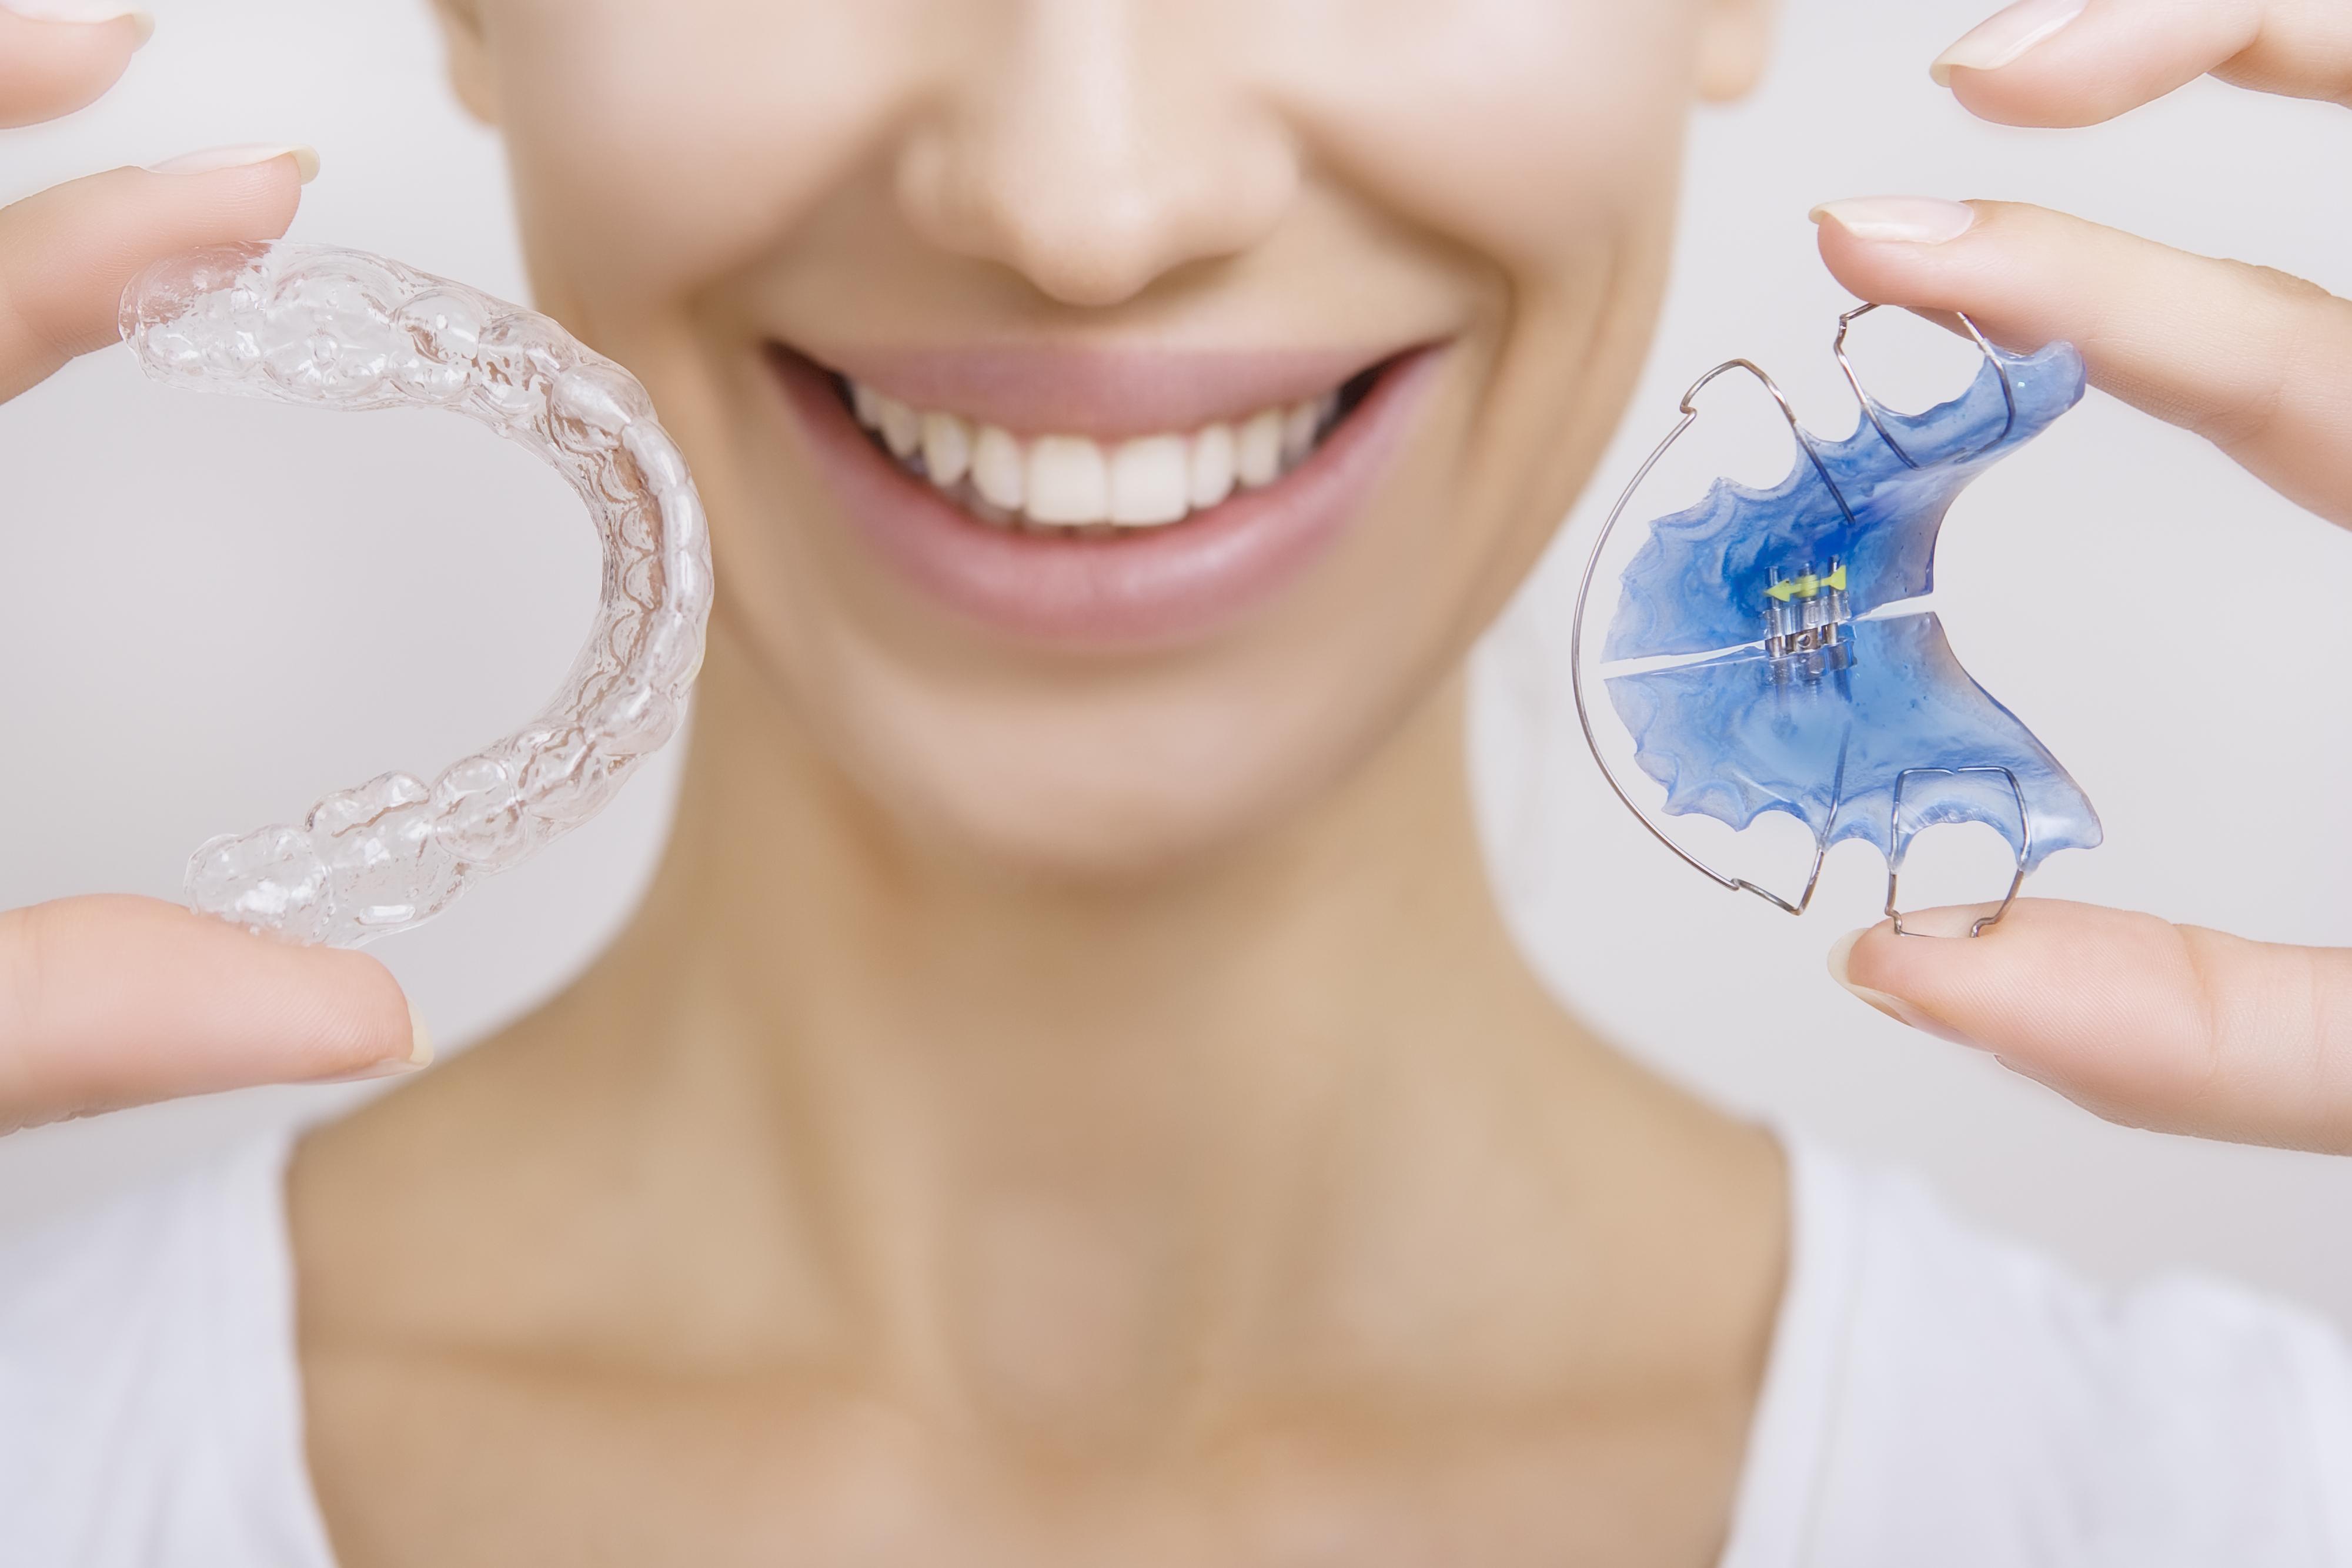 ¿Existe la ortodoncia nocturna? 7